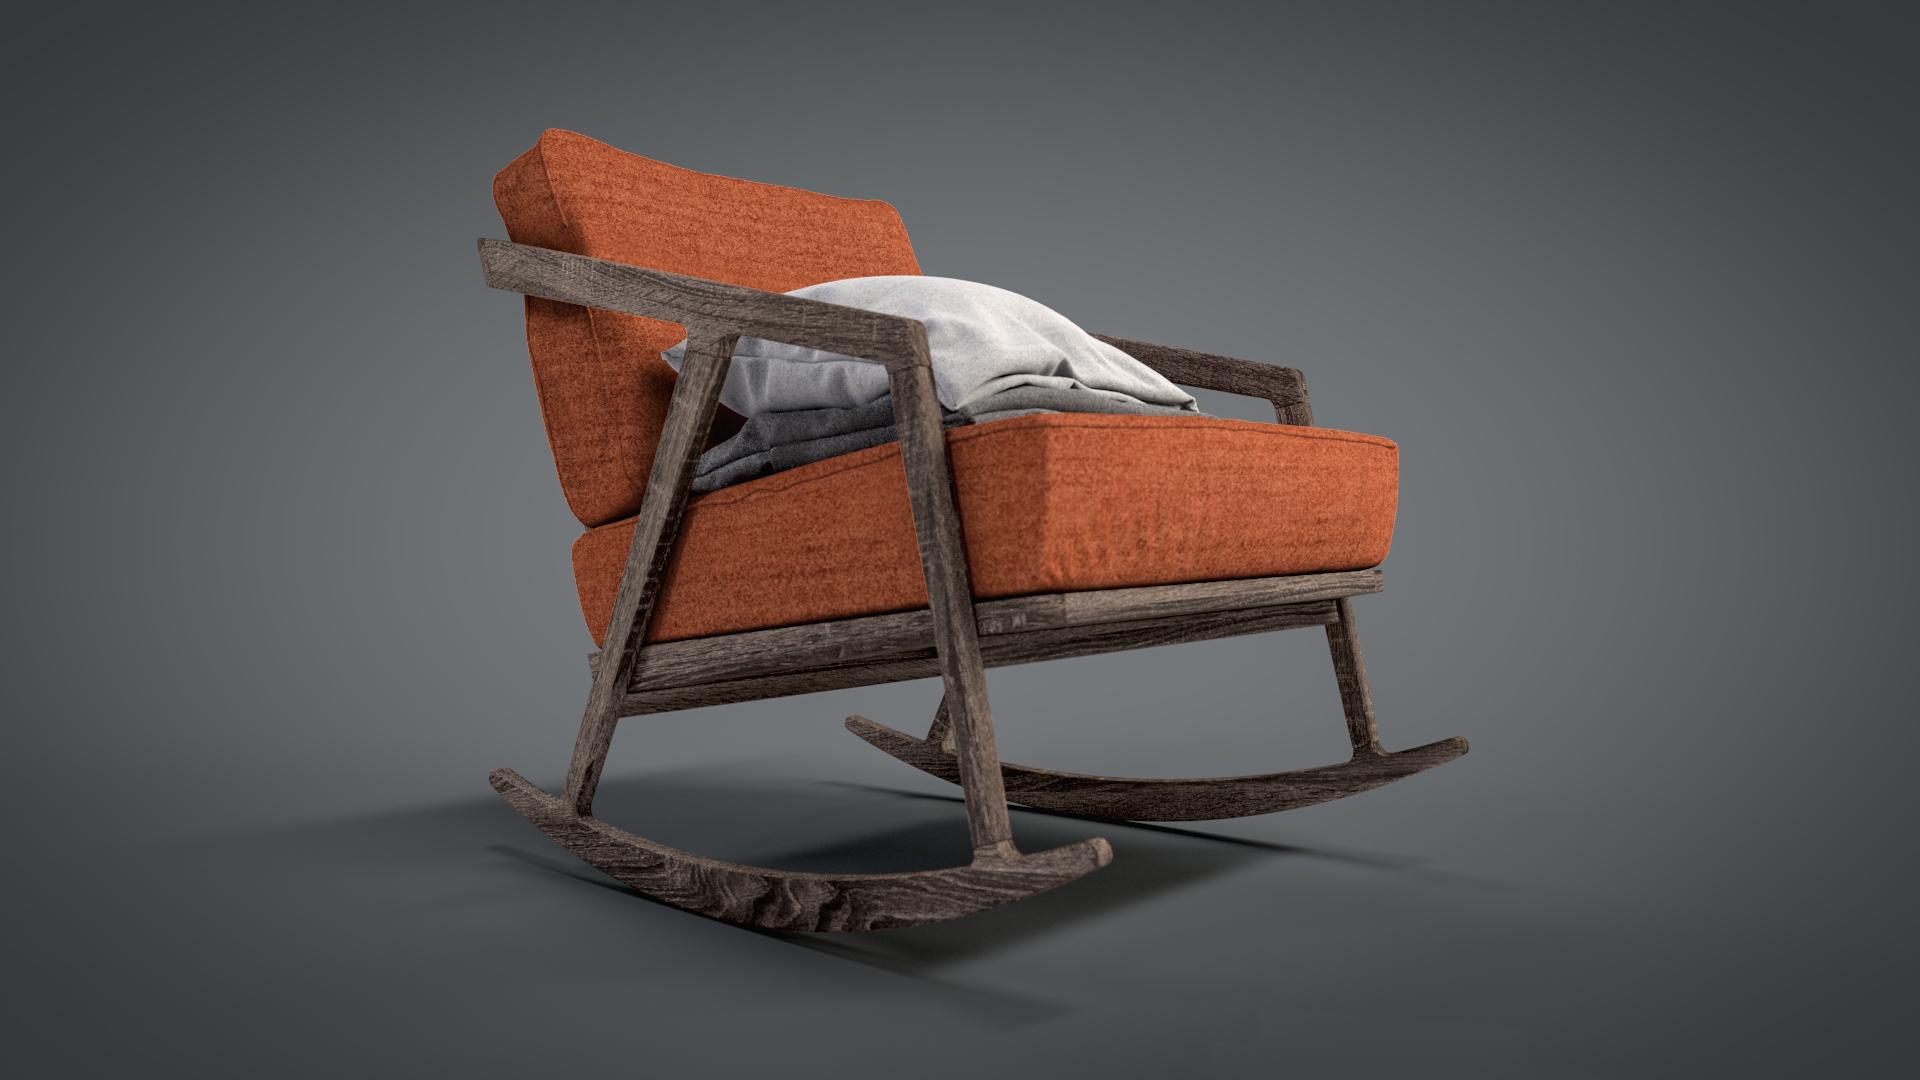 Katakana rocking chair